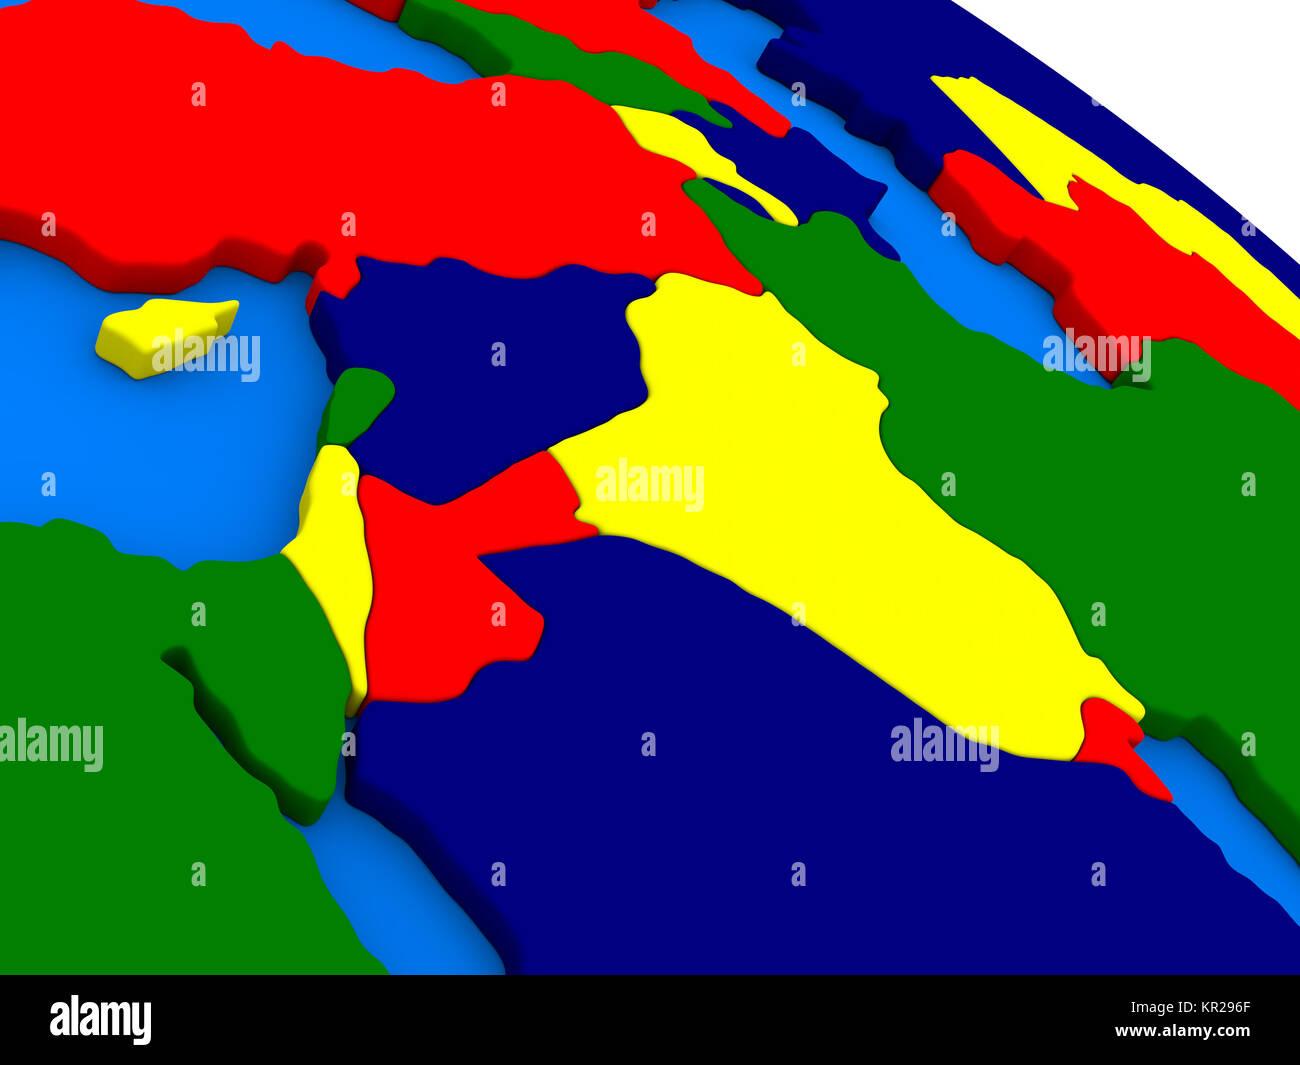 Israel lebanon jordan syria and iraq region on colorful 3d globe israel lebanon jordan syria and iraq region on colorful 3d globe gumiabroncs Image collections